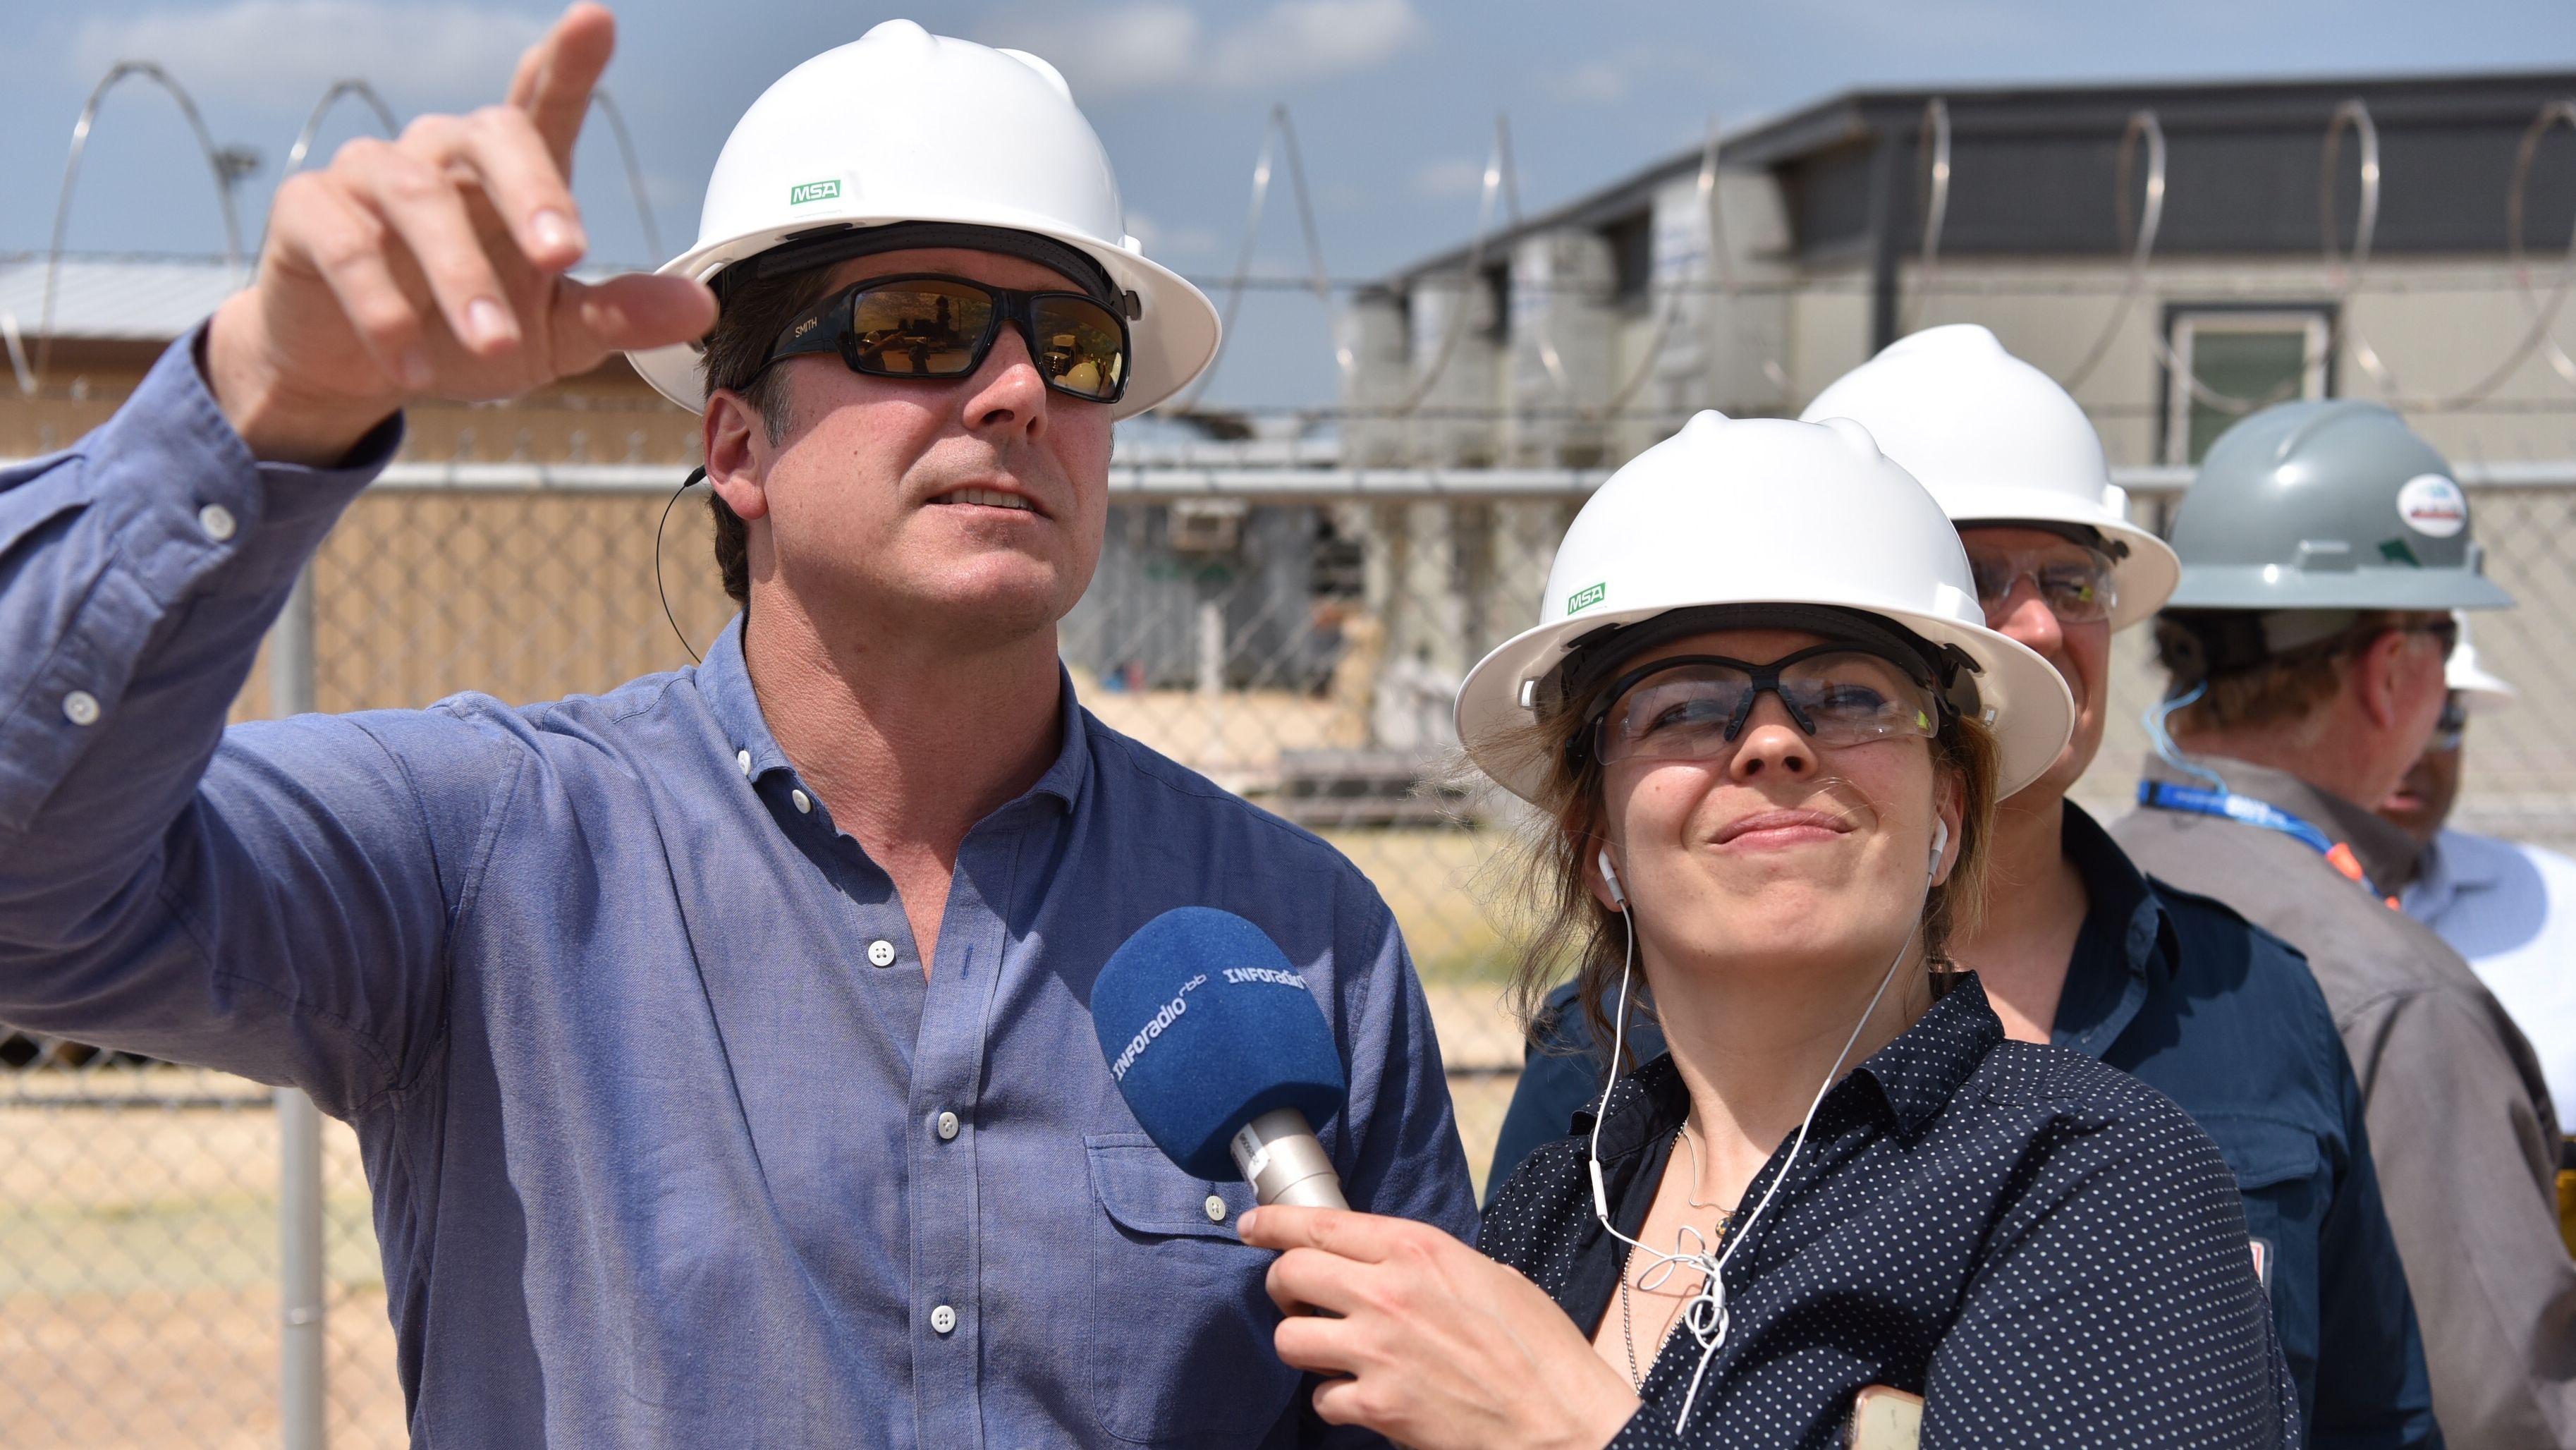 Reporterin Bettina Meier im Gespräch mit John Tobola. Er ist leitender Manager bei Freeport LNG.